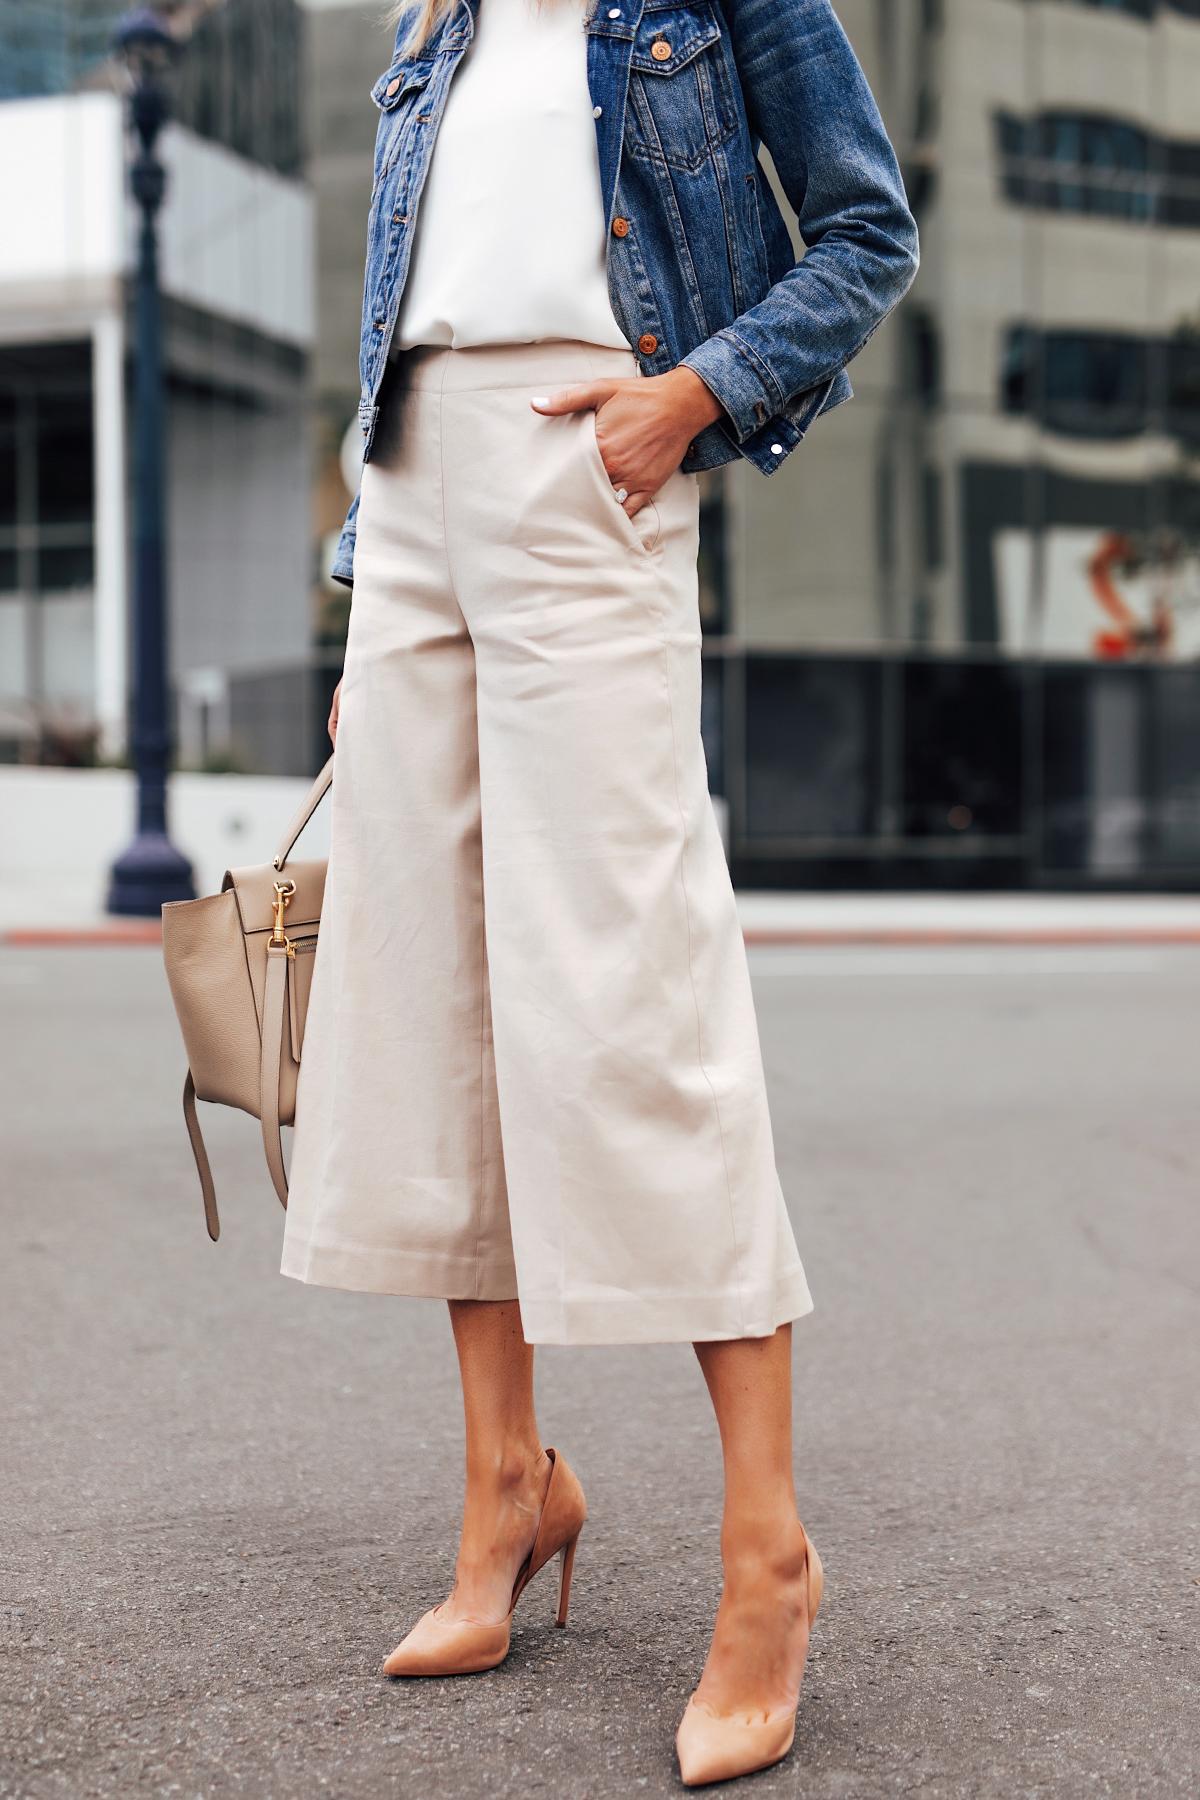 Fashion Jackson Wearing Denim Jacket White Top Khaki Cropped Pants Nude Heels